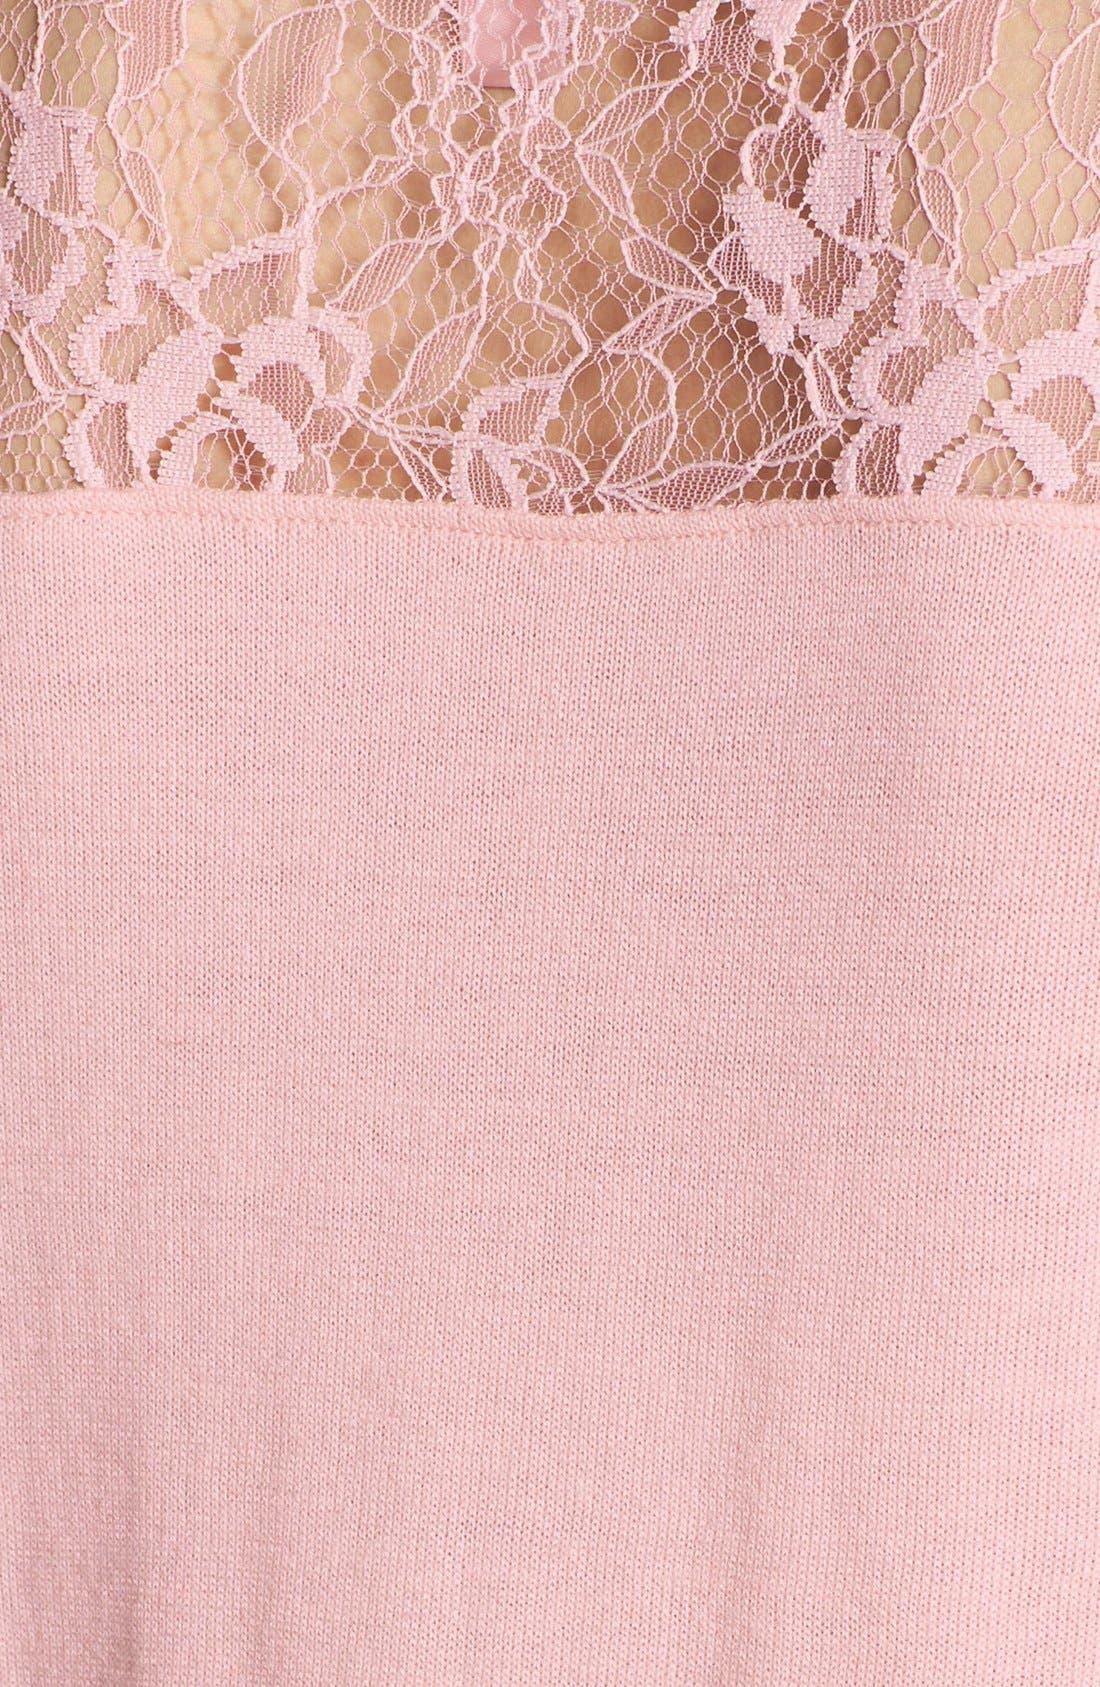 Alternate Image 3  - Chelsea28 Lace Yoke Sweater